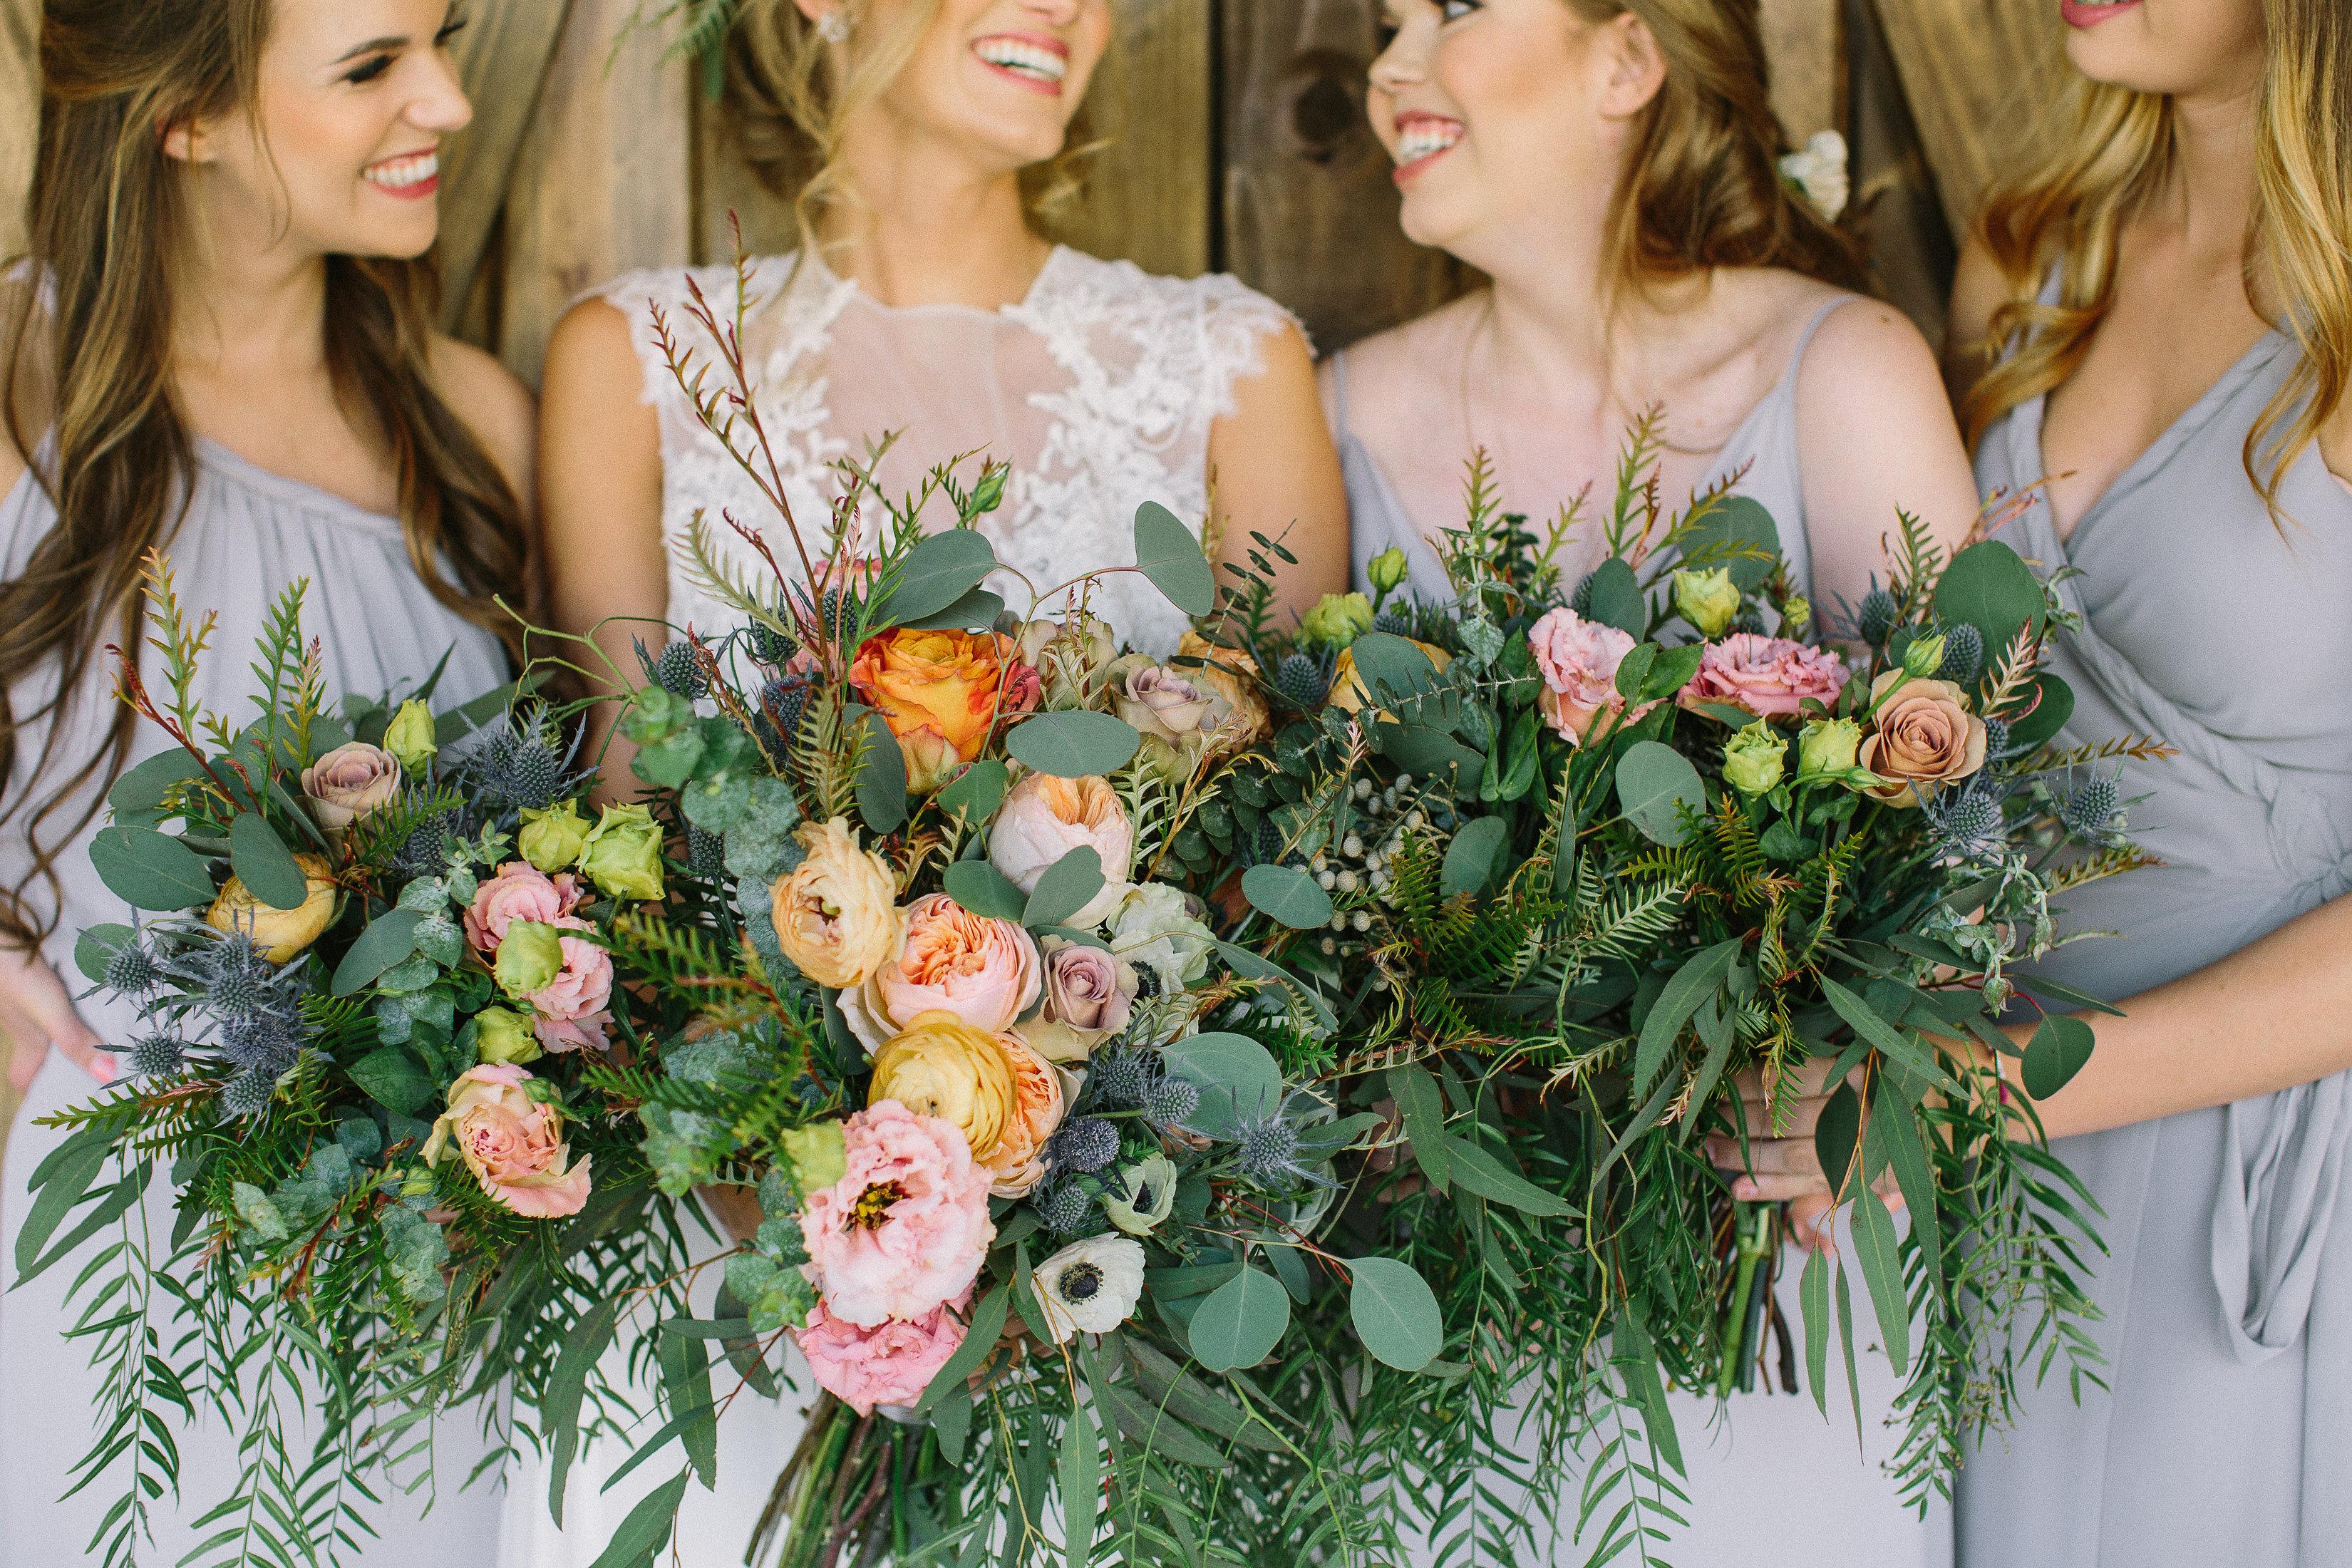 Ellen-Ashton-Photography-Peach-Creek-Ranch-Weddings-Wed-and-Prosper57